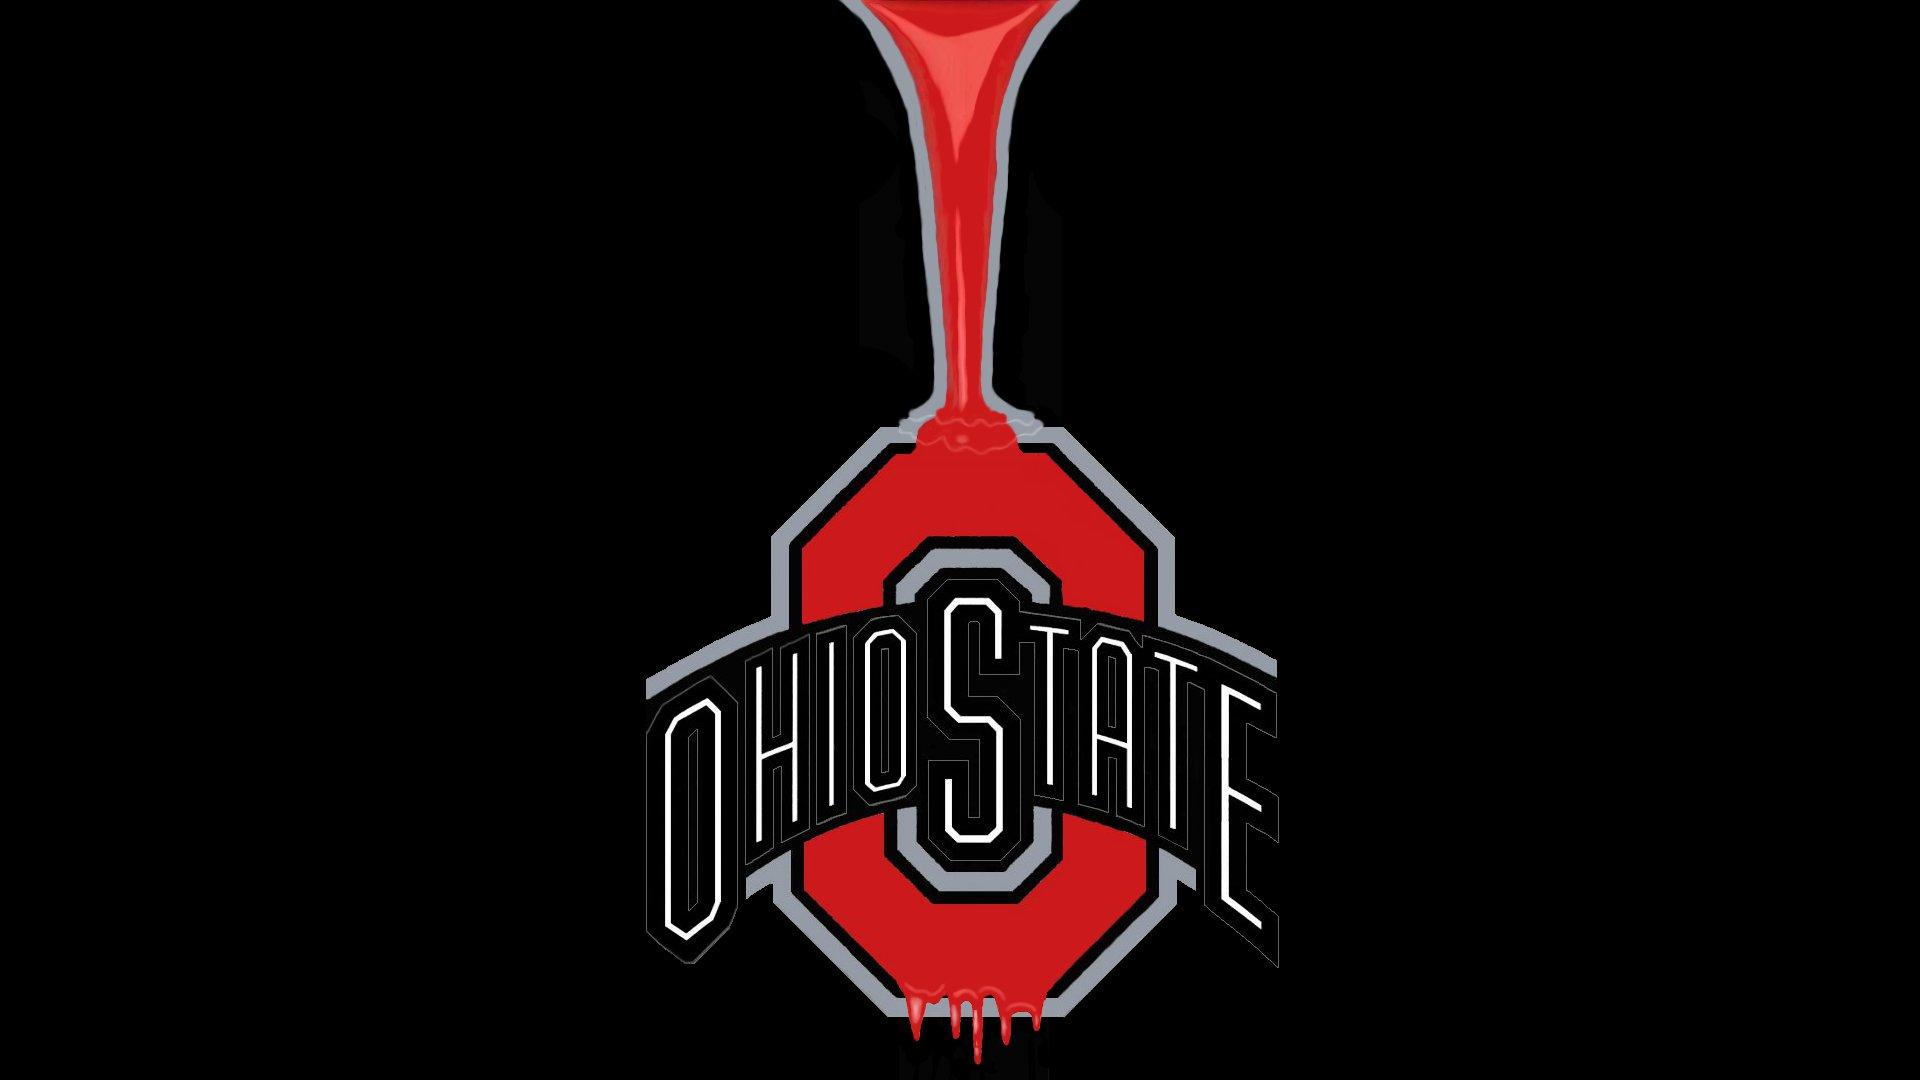 Ohio State Paint   1920x1080   169 1920x1080